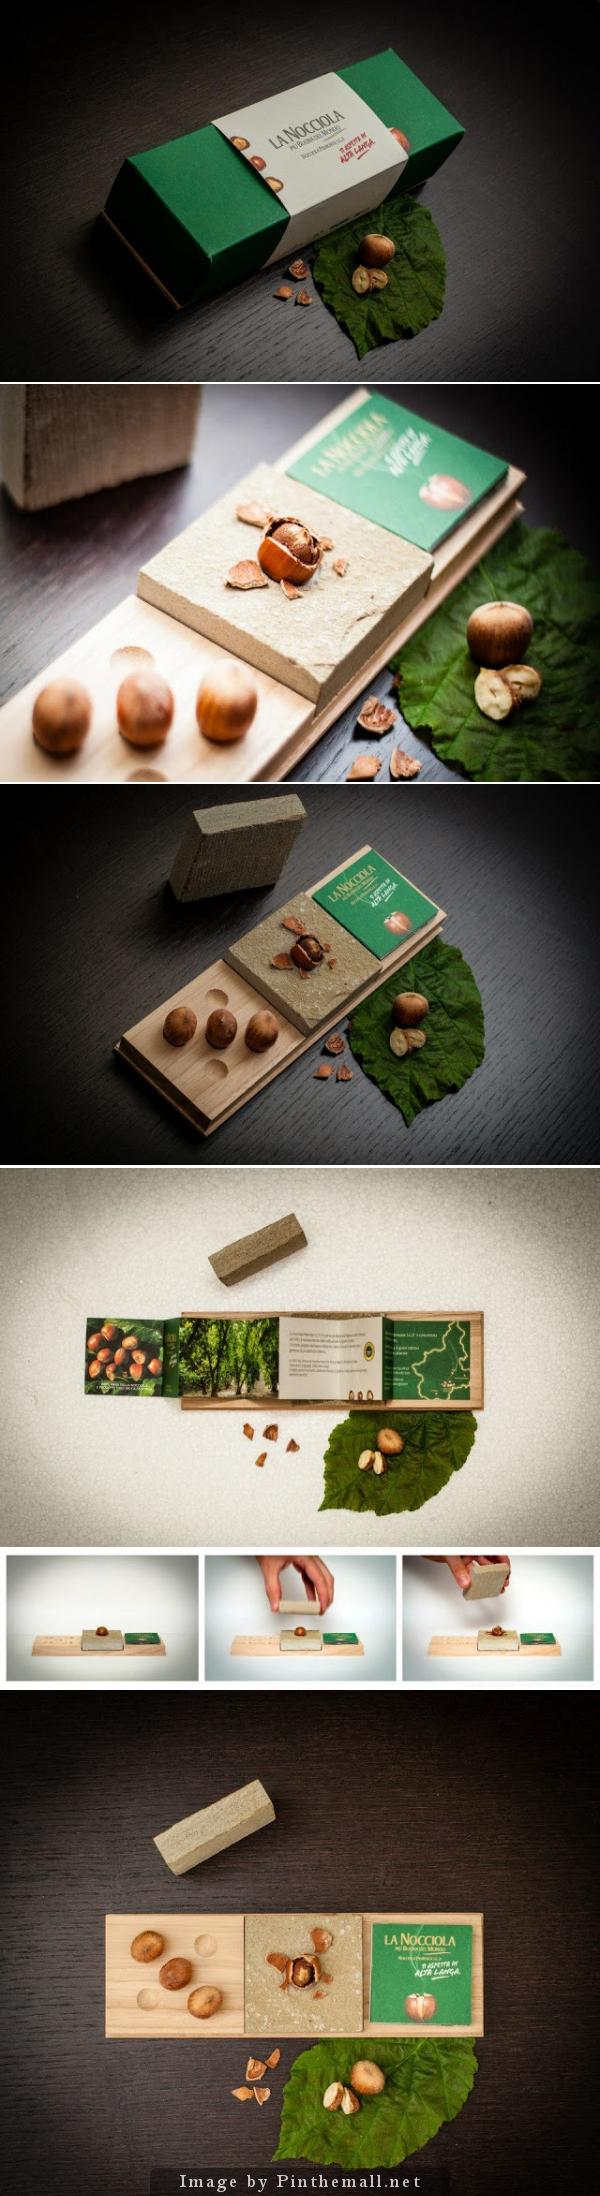 Nocciolart branding pinterest produktdesign und produkte for Produktdesign jobs